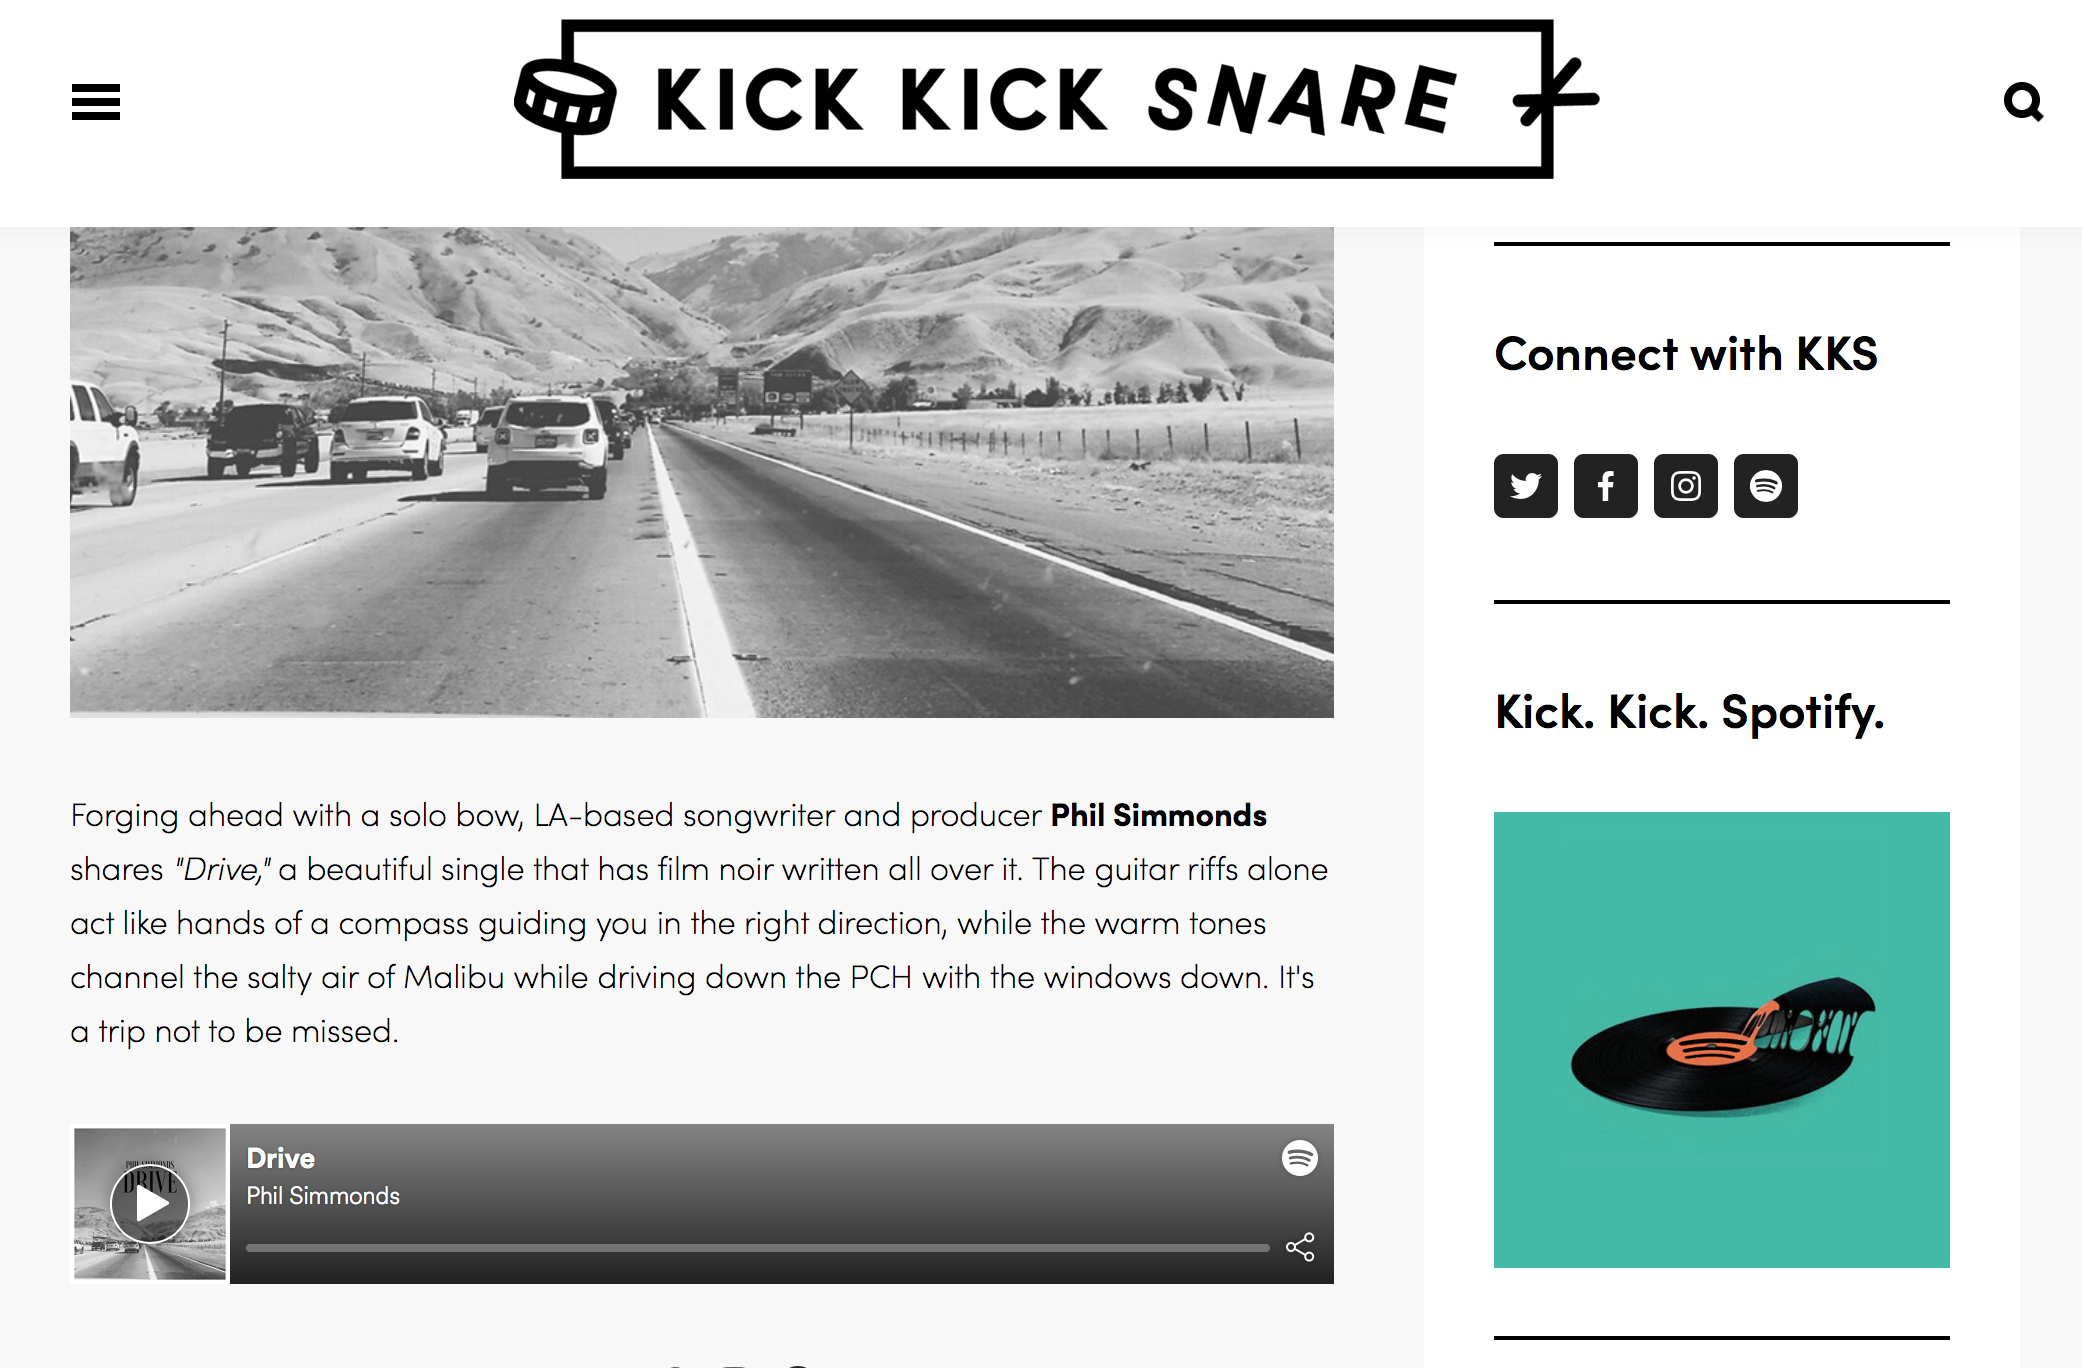 Kick Kick Snare -